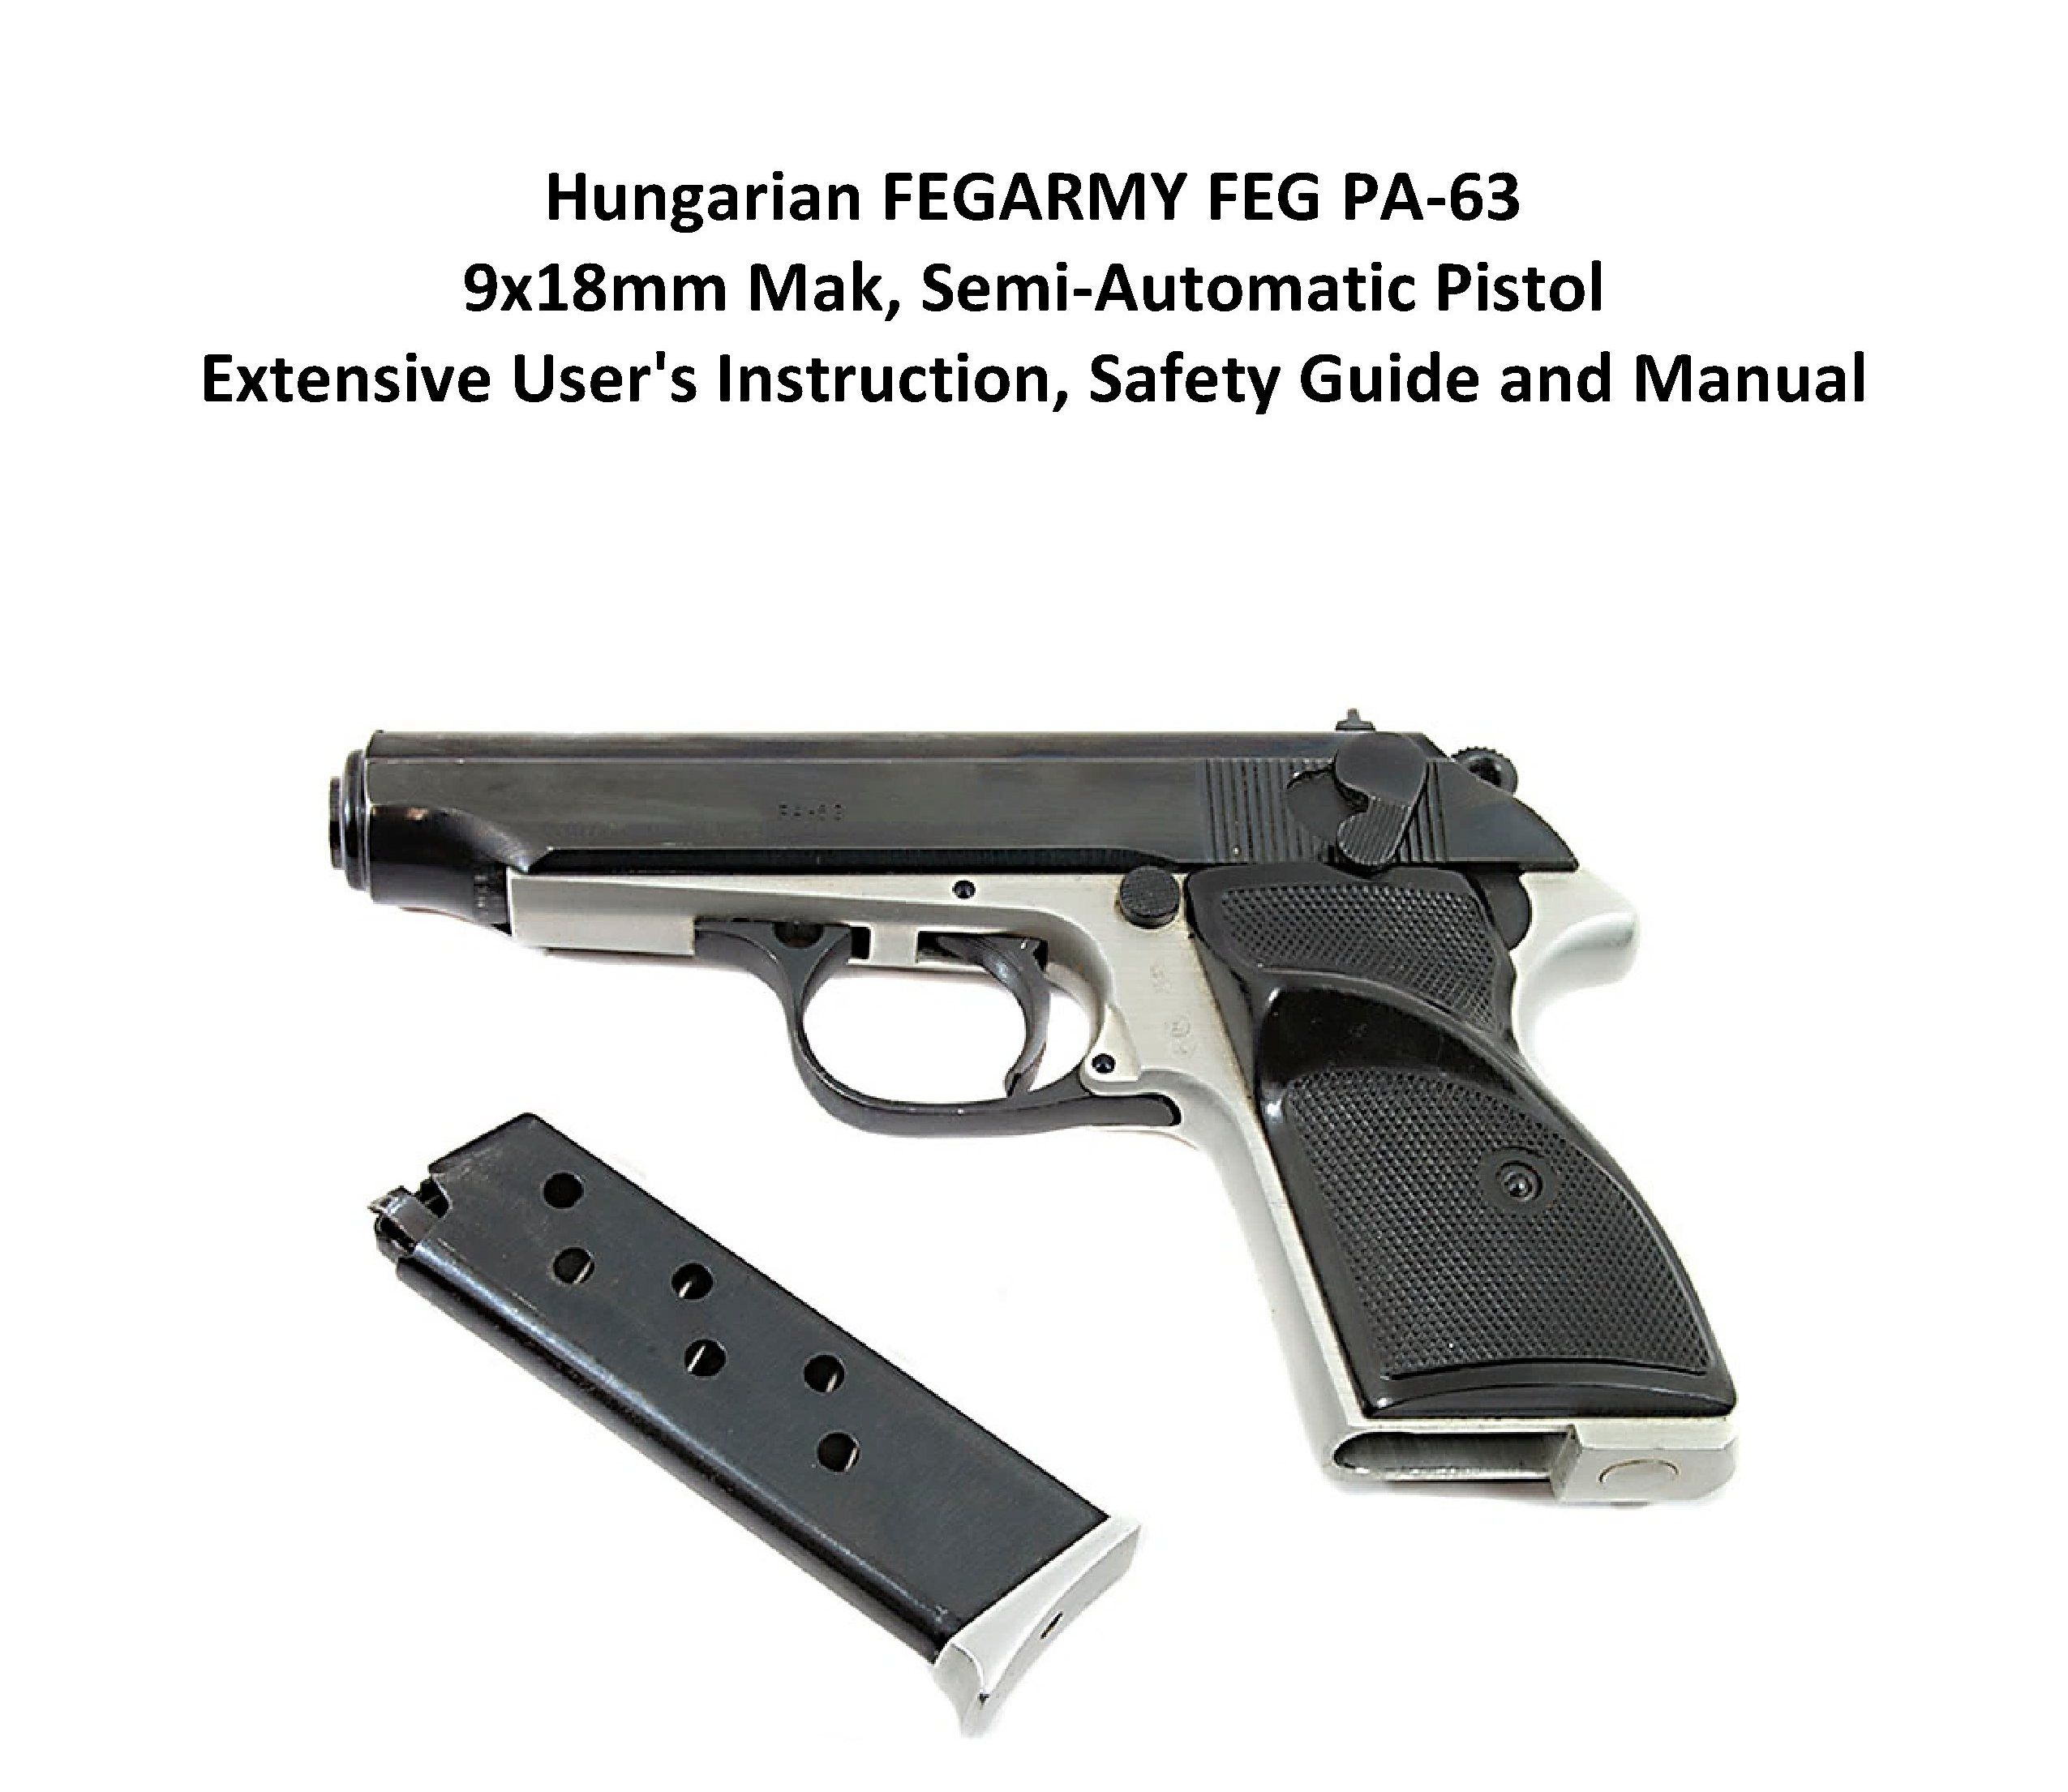 hungarian fegarmy feg pa 63 9x18mm mak semi automatic pistol rh pinterest com Handgun Stand Handgun in Hand